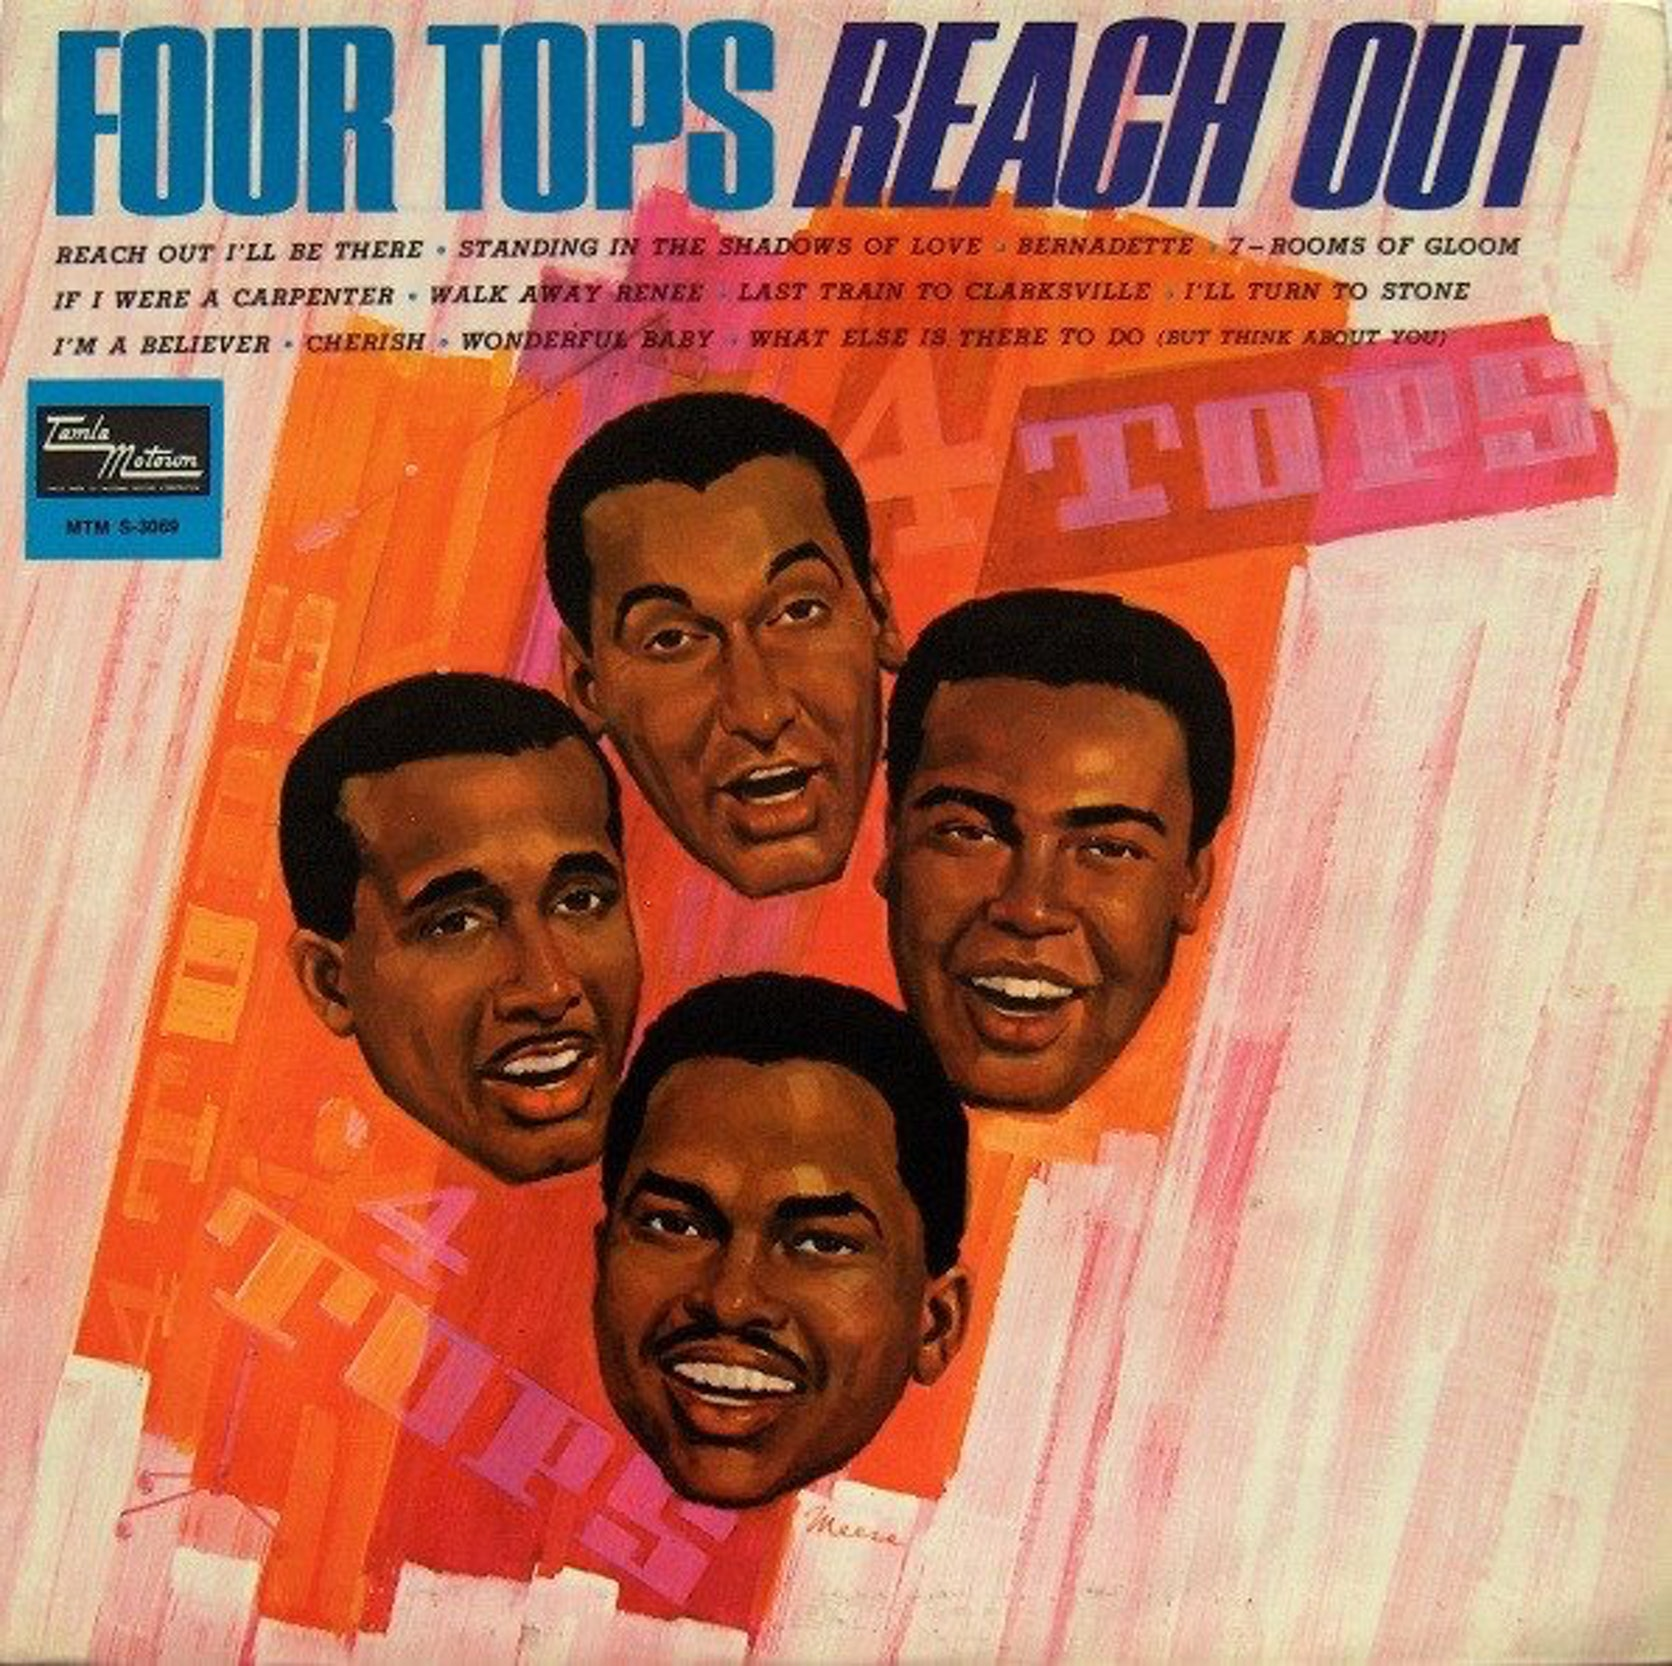 The 10 Best Motown Albums To Own On Vinyl Vinyl Me Please